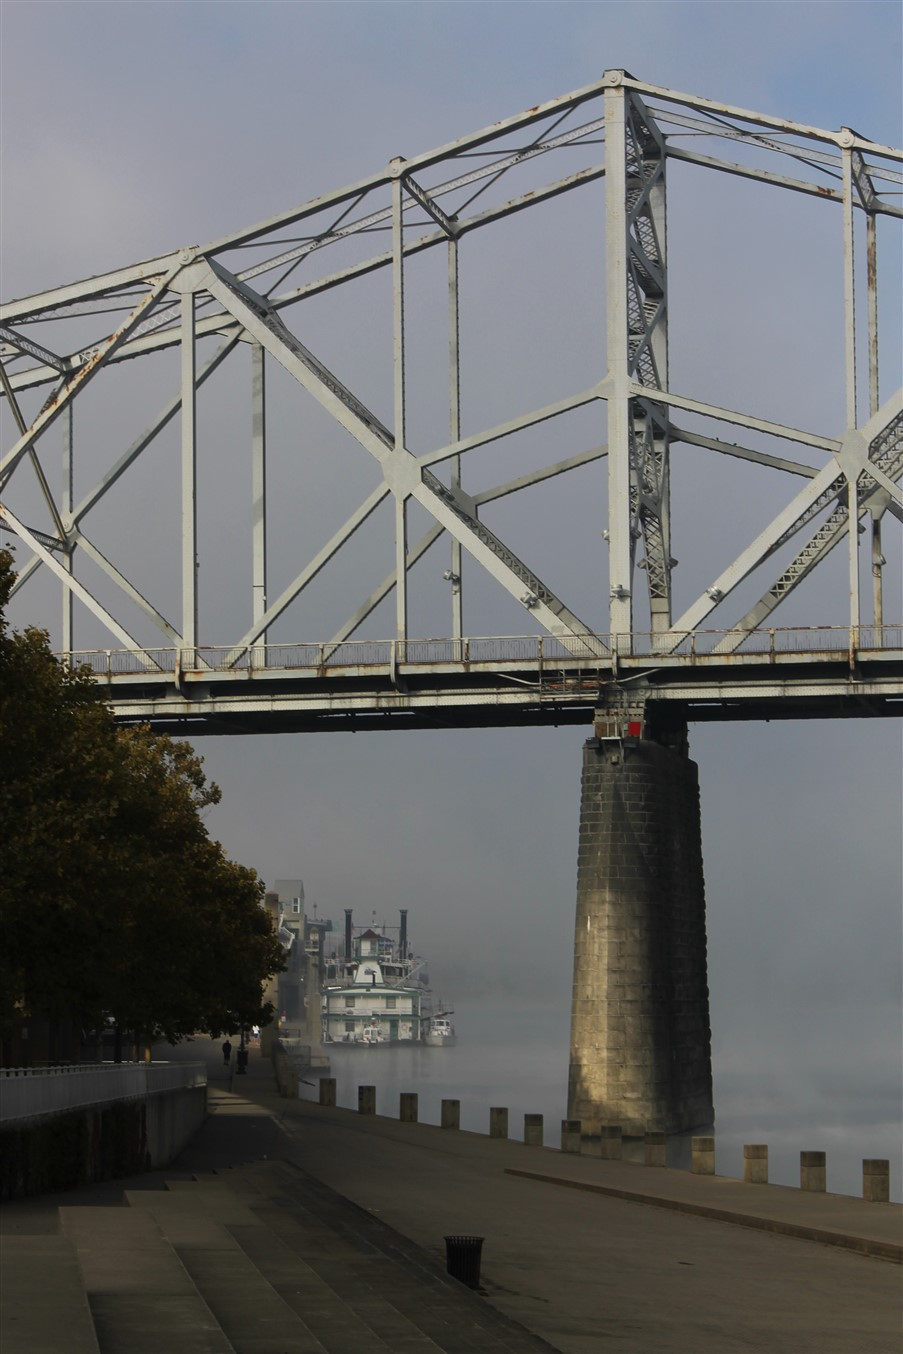 2013 10 27 51 Louisville.jpg